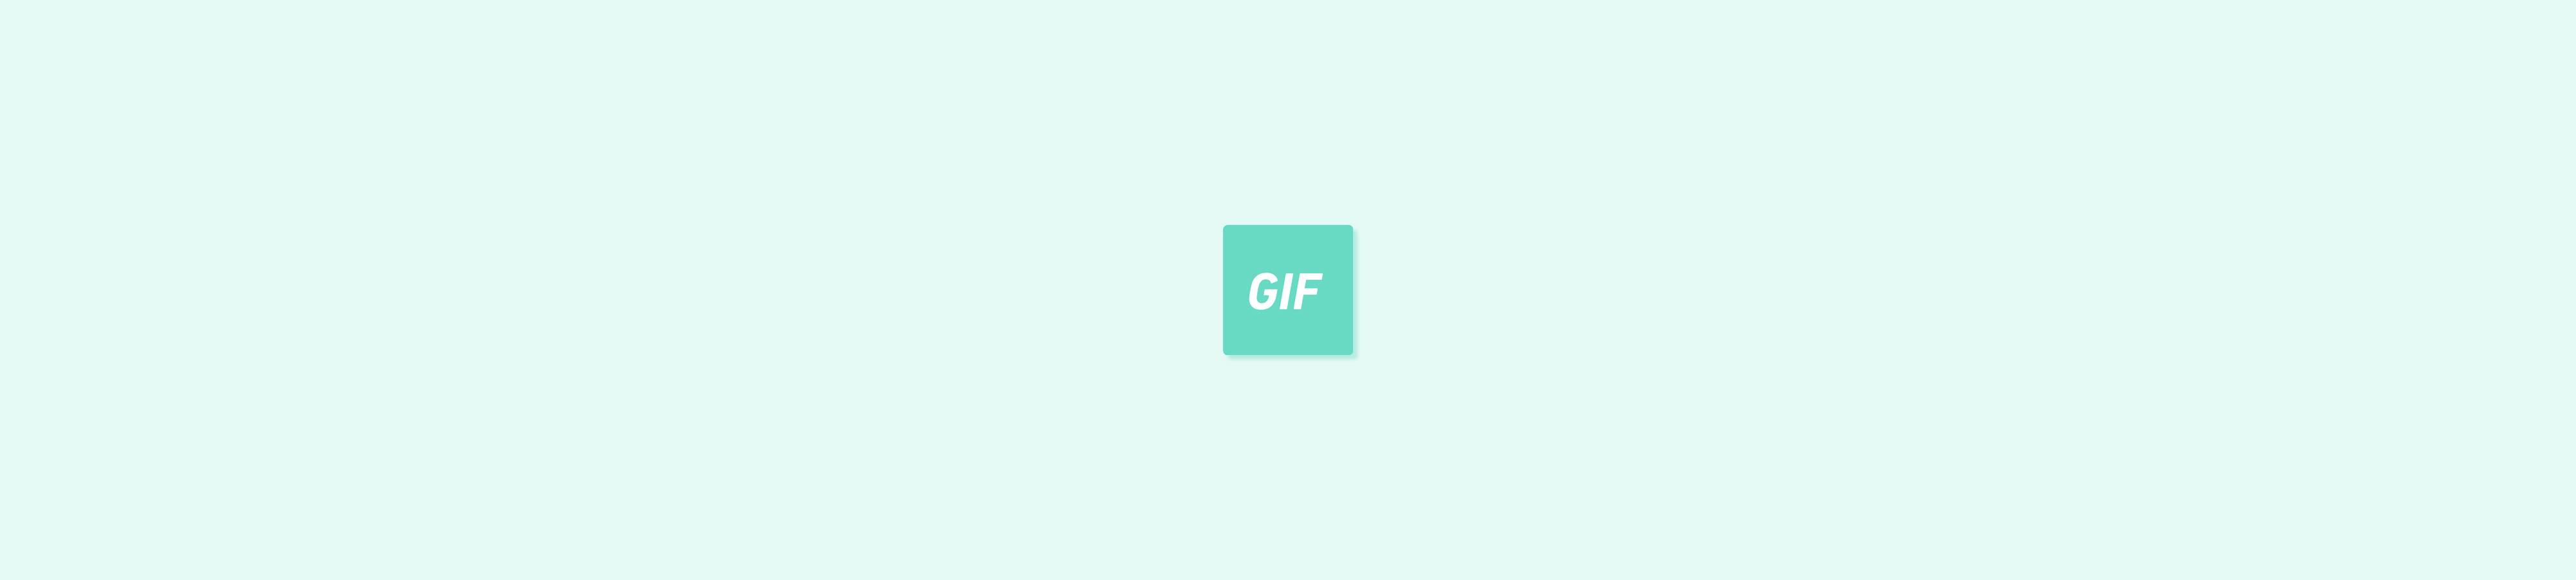 gif动图太大,用docsmall提供的gif在线压缩工具一步搞定